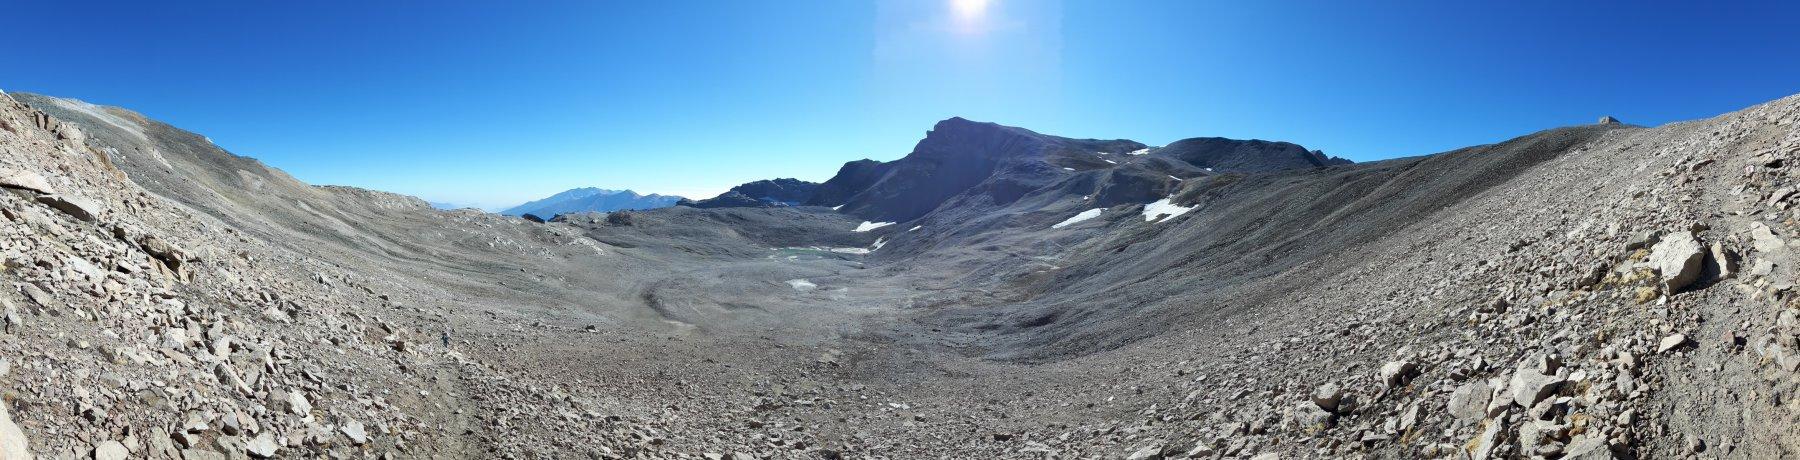 Gli ex ghiacciaio e lago Galambra.